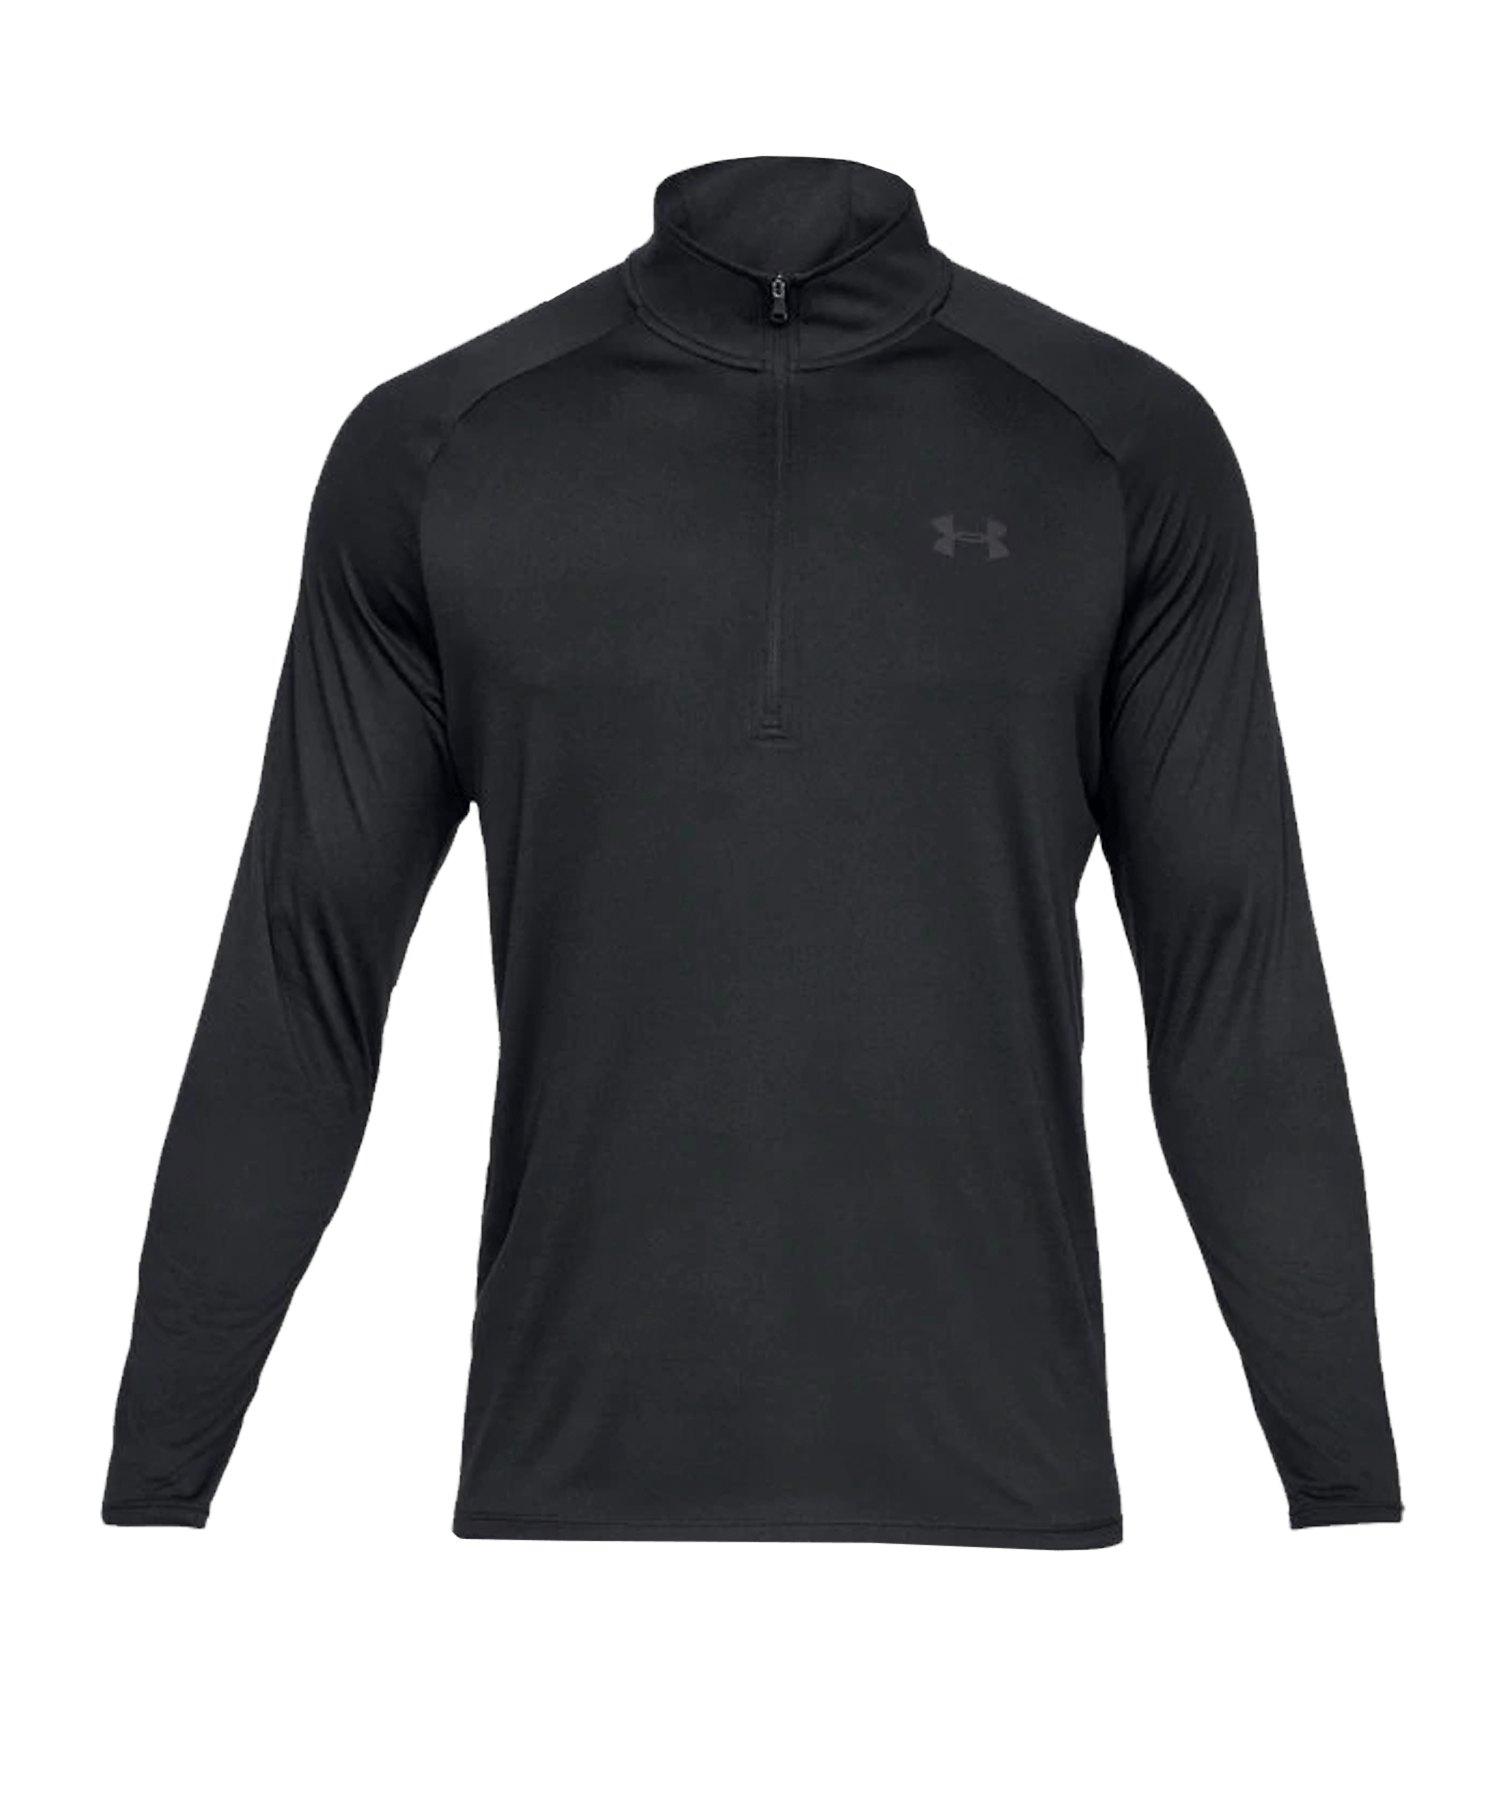 Under Armour Tech 1/2 Zip Shirt Schwarz F001 - schwarz